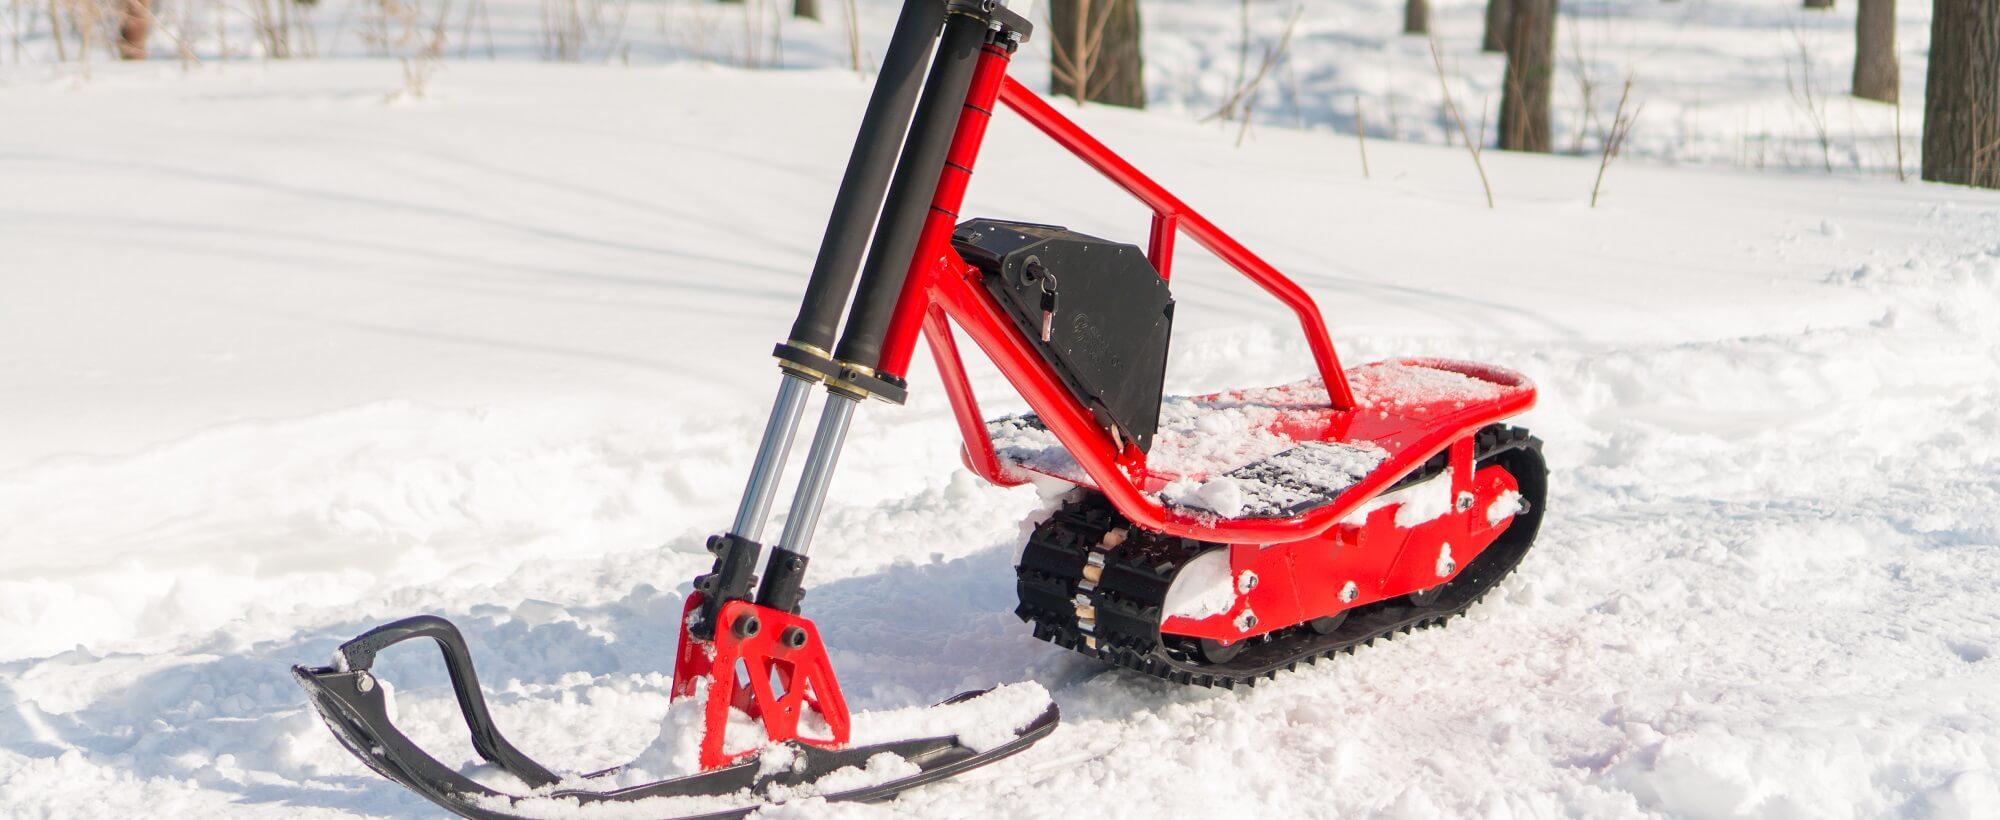 Elecrtric-snowbike_slider_6